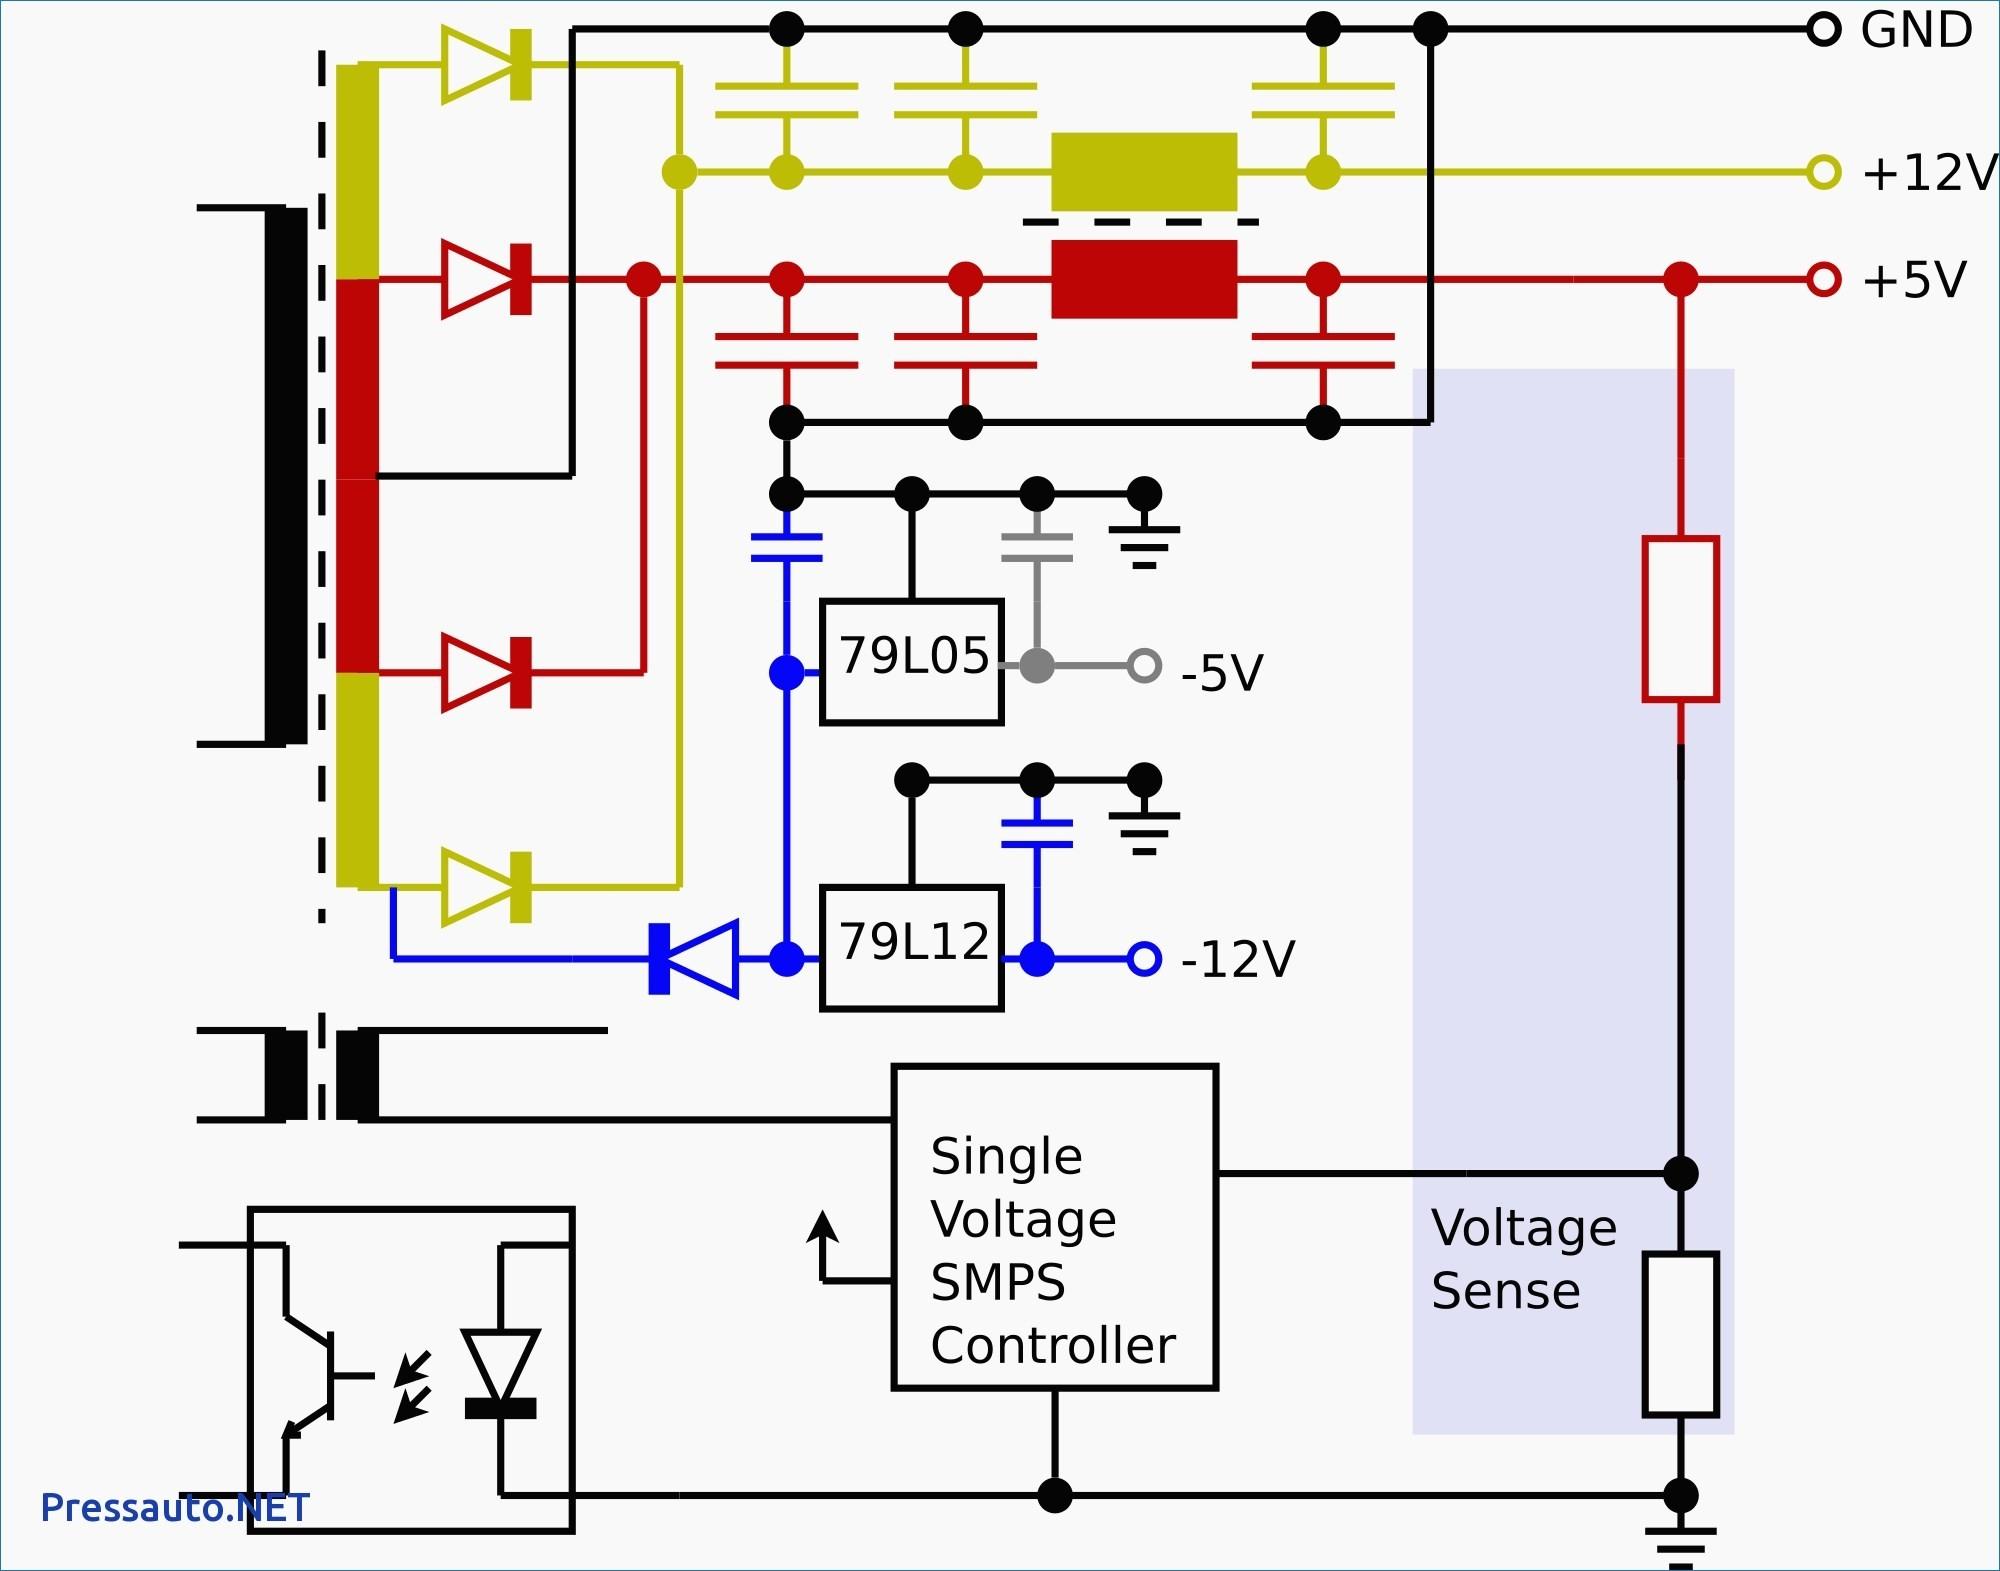 12v Transformer Wiring Diagram 12v Transformer Wiring Diagram Tearing 24  Volt and 12v B2network Of 12v